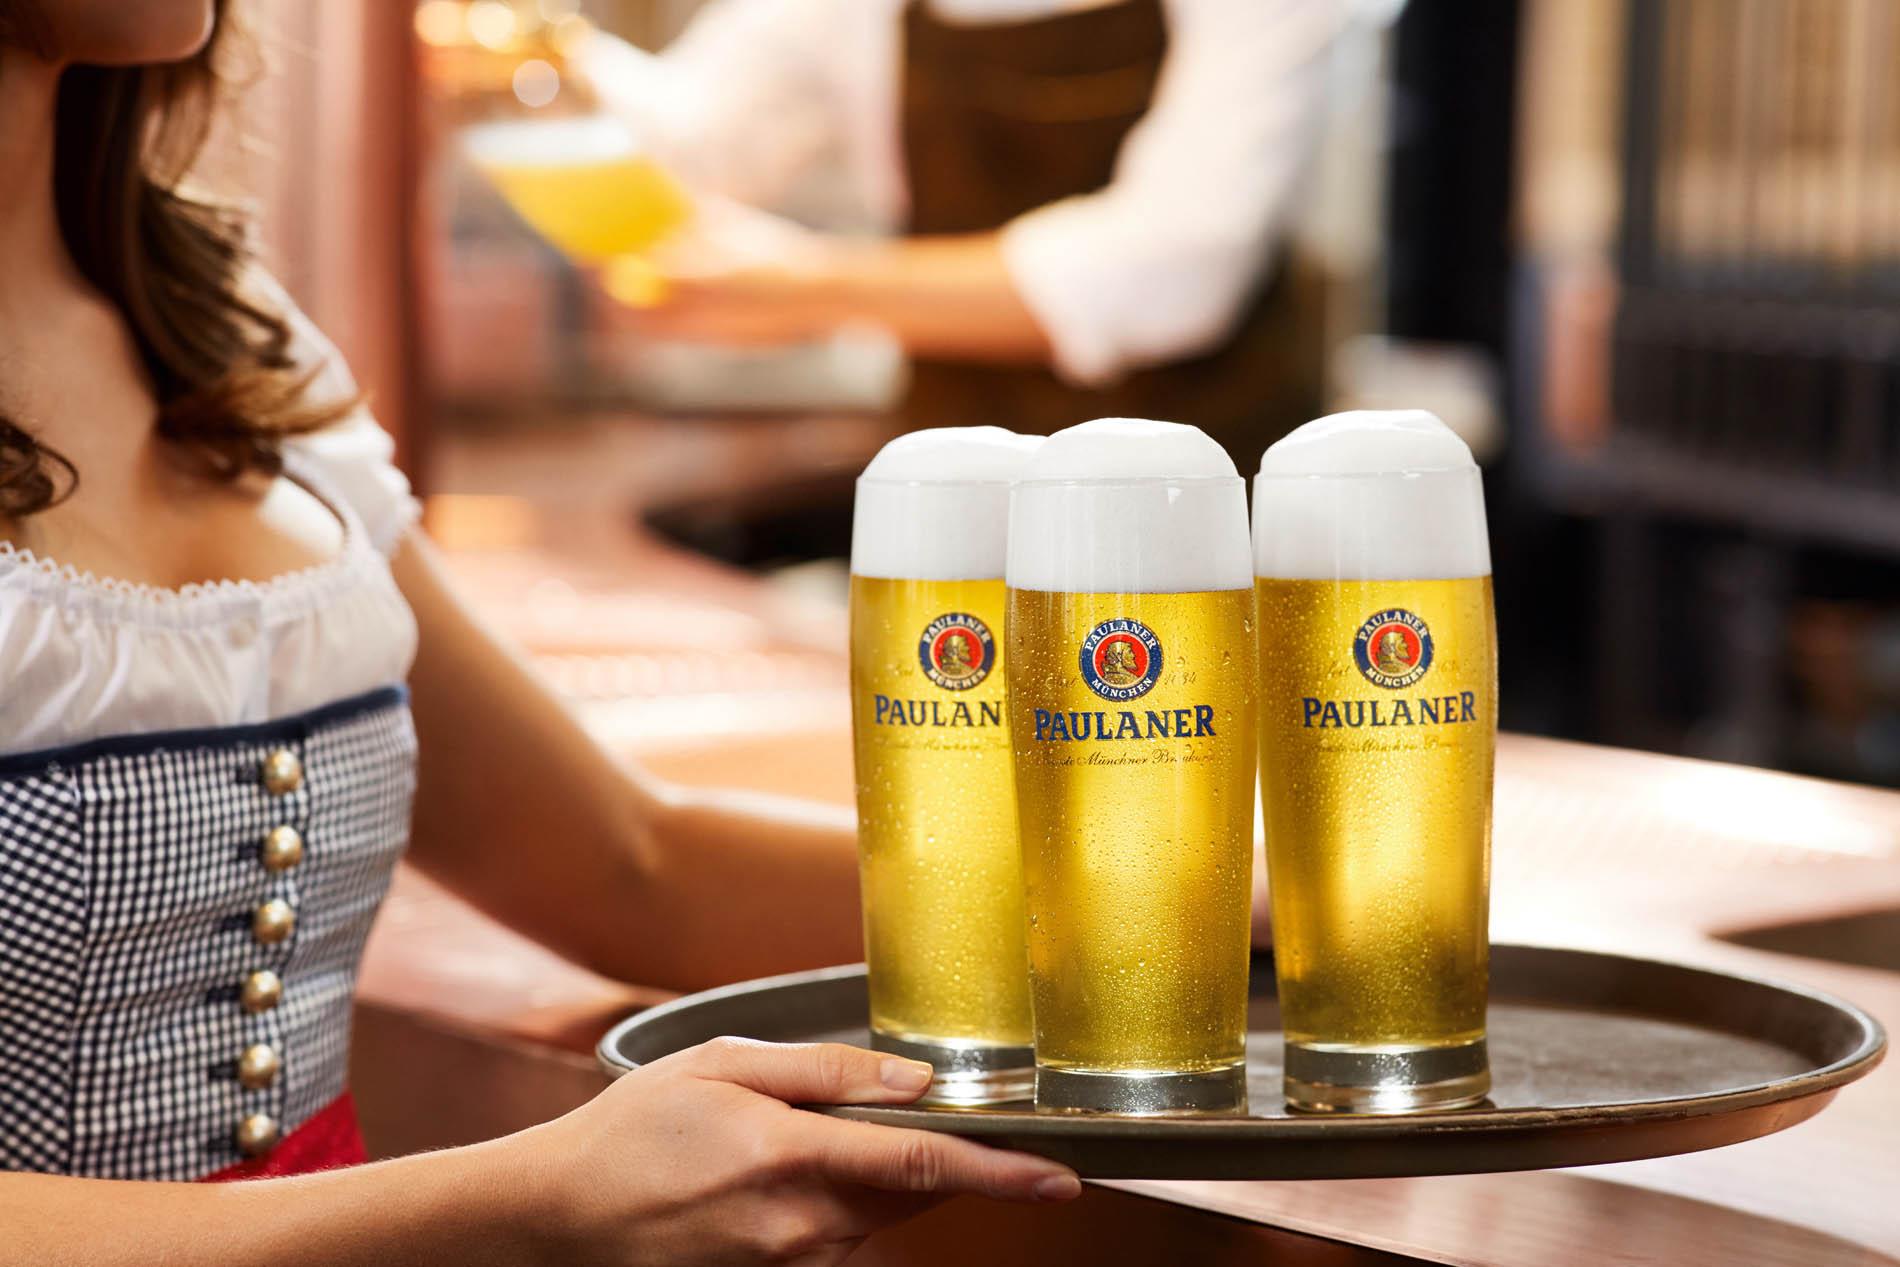 Paulaner Bier